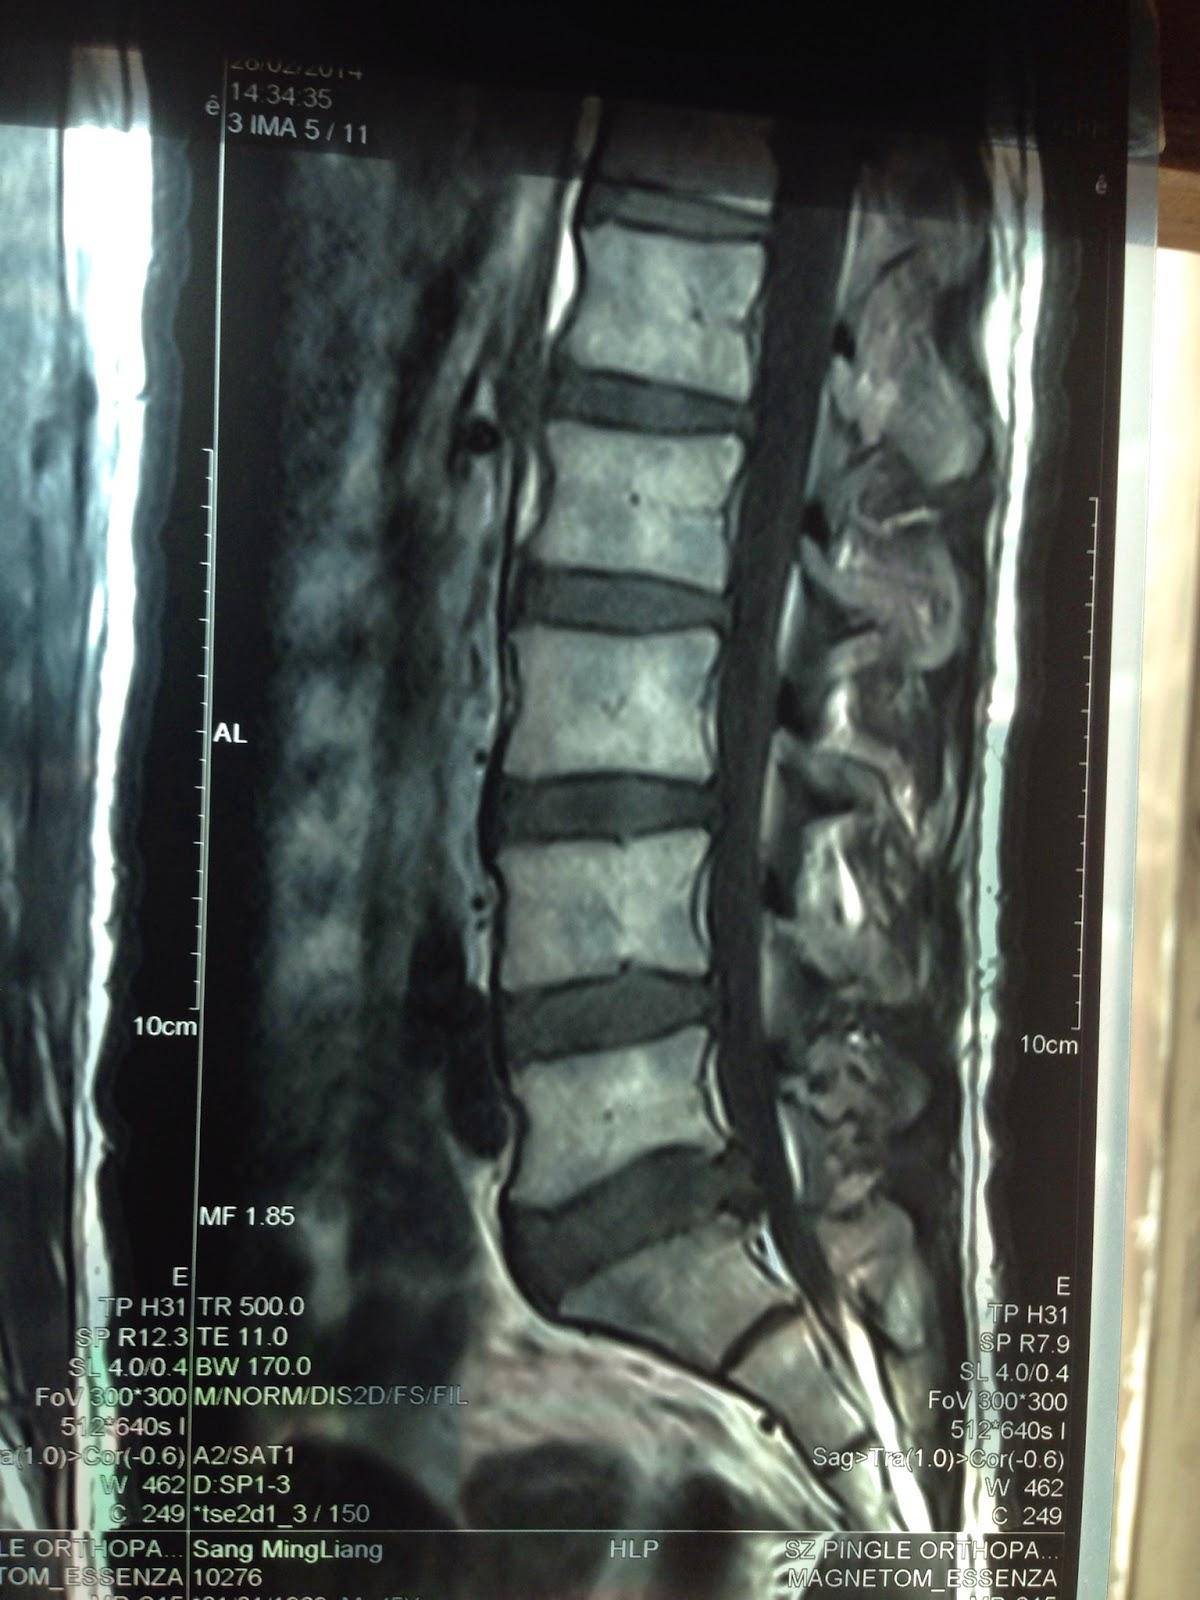 AKA博田法3回目/回復と効果 | 腰椎椎間板ヘルニアと坐骨神経痛の ...